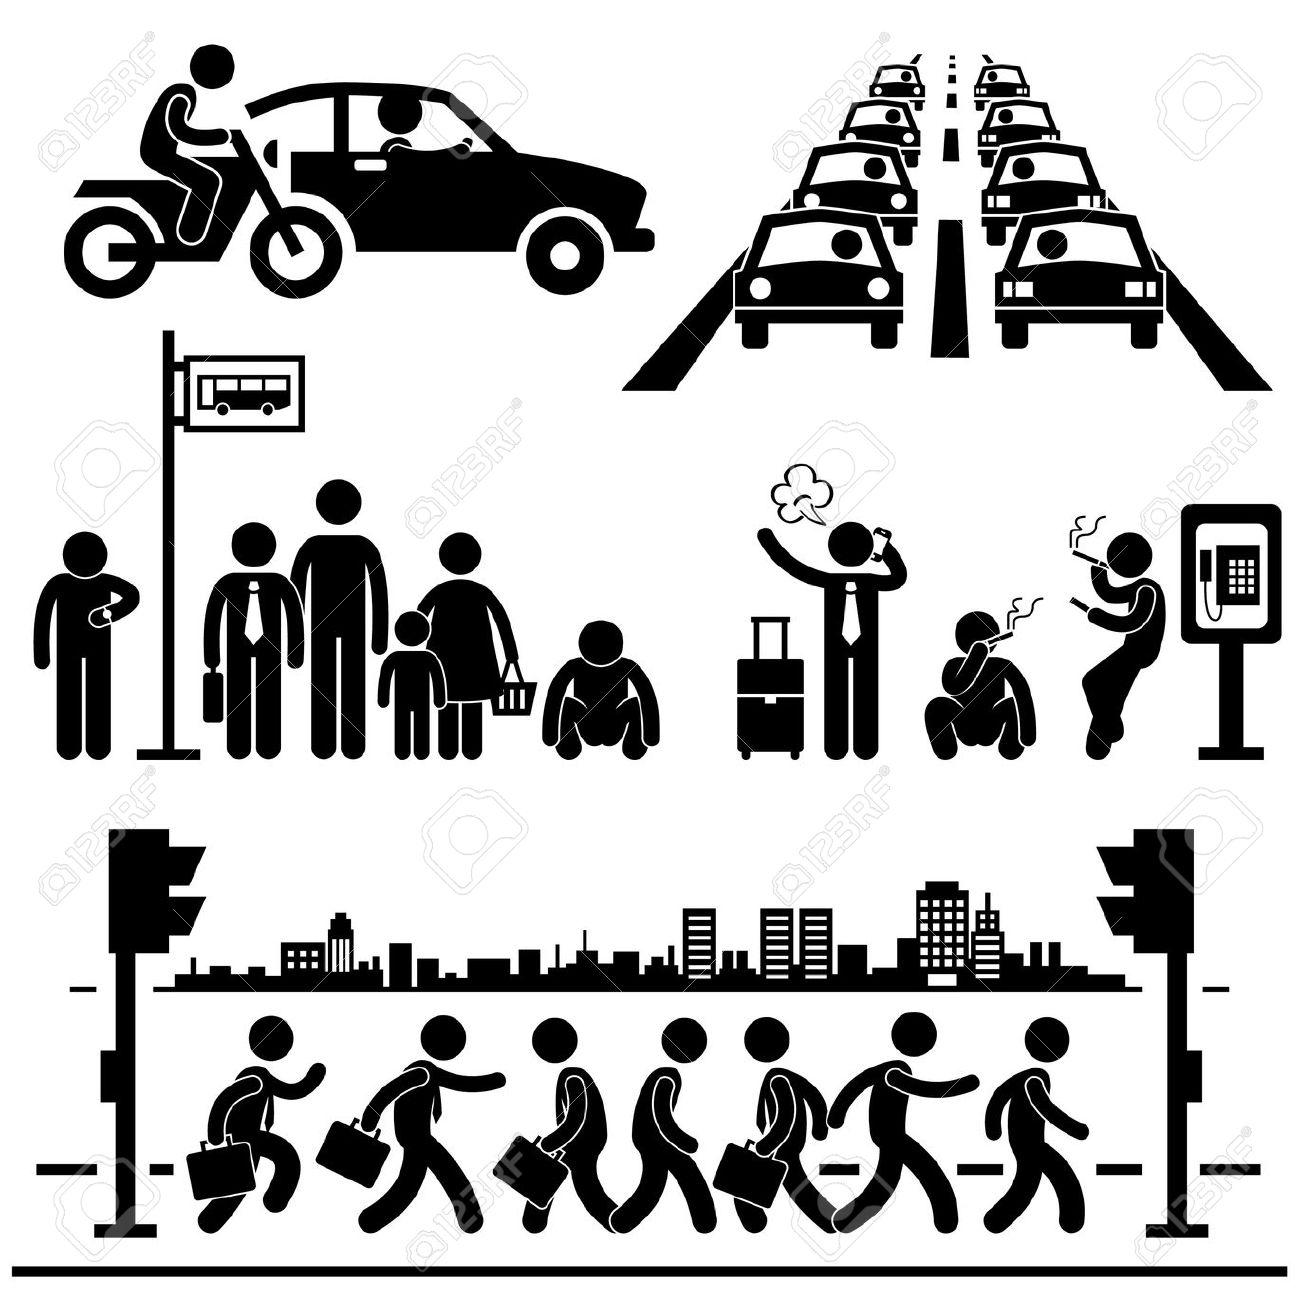 Traffic clipart busy street Royalty Free City Traffic Rush